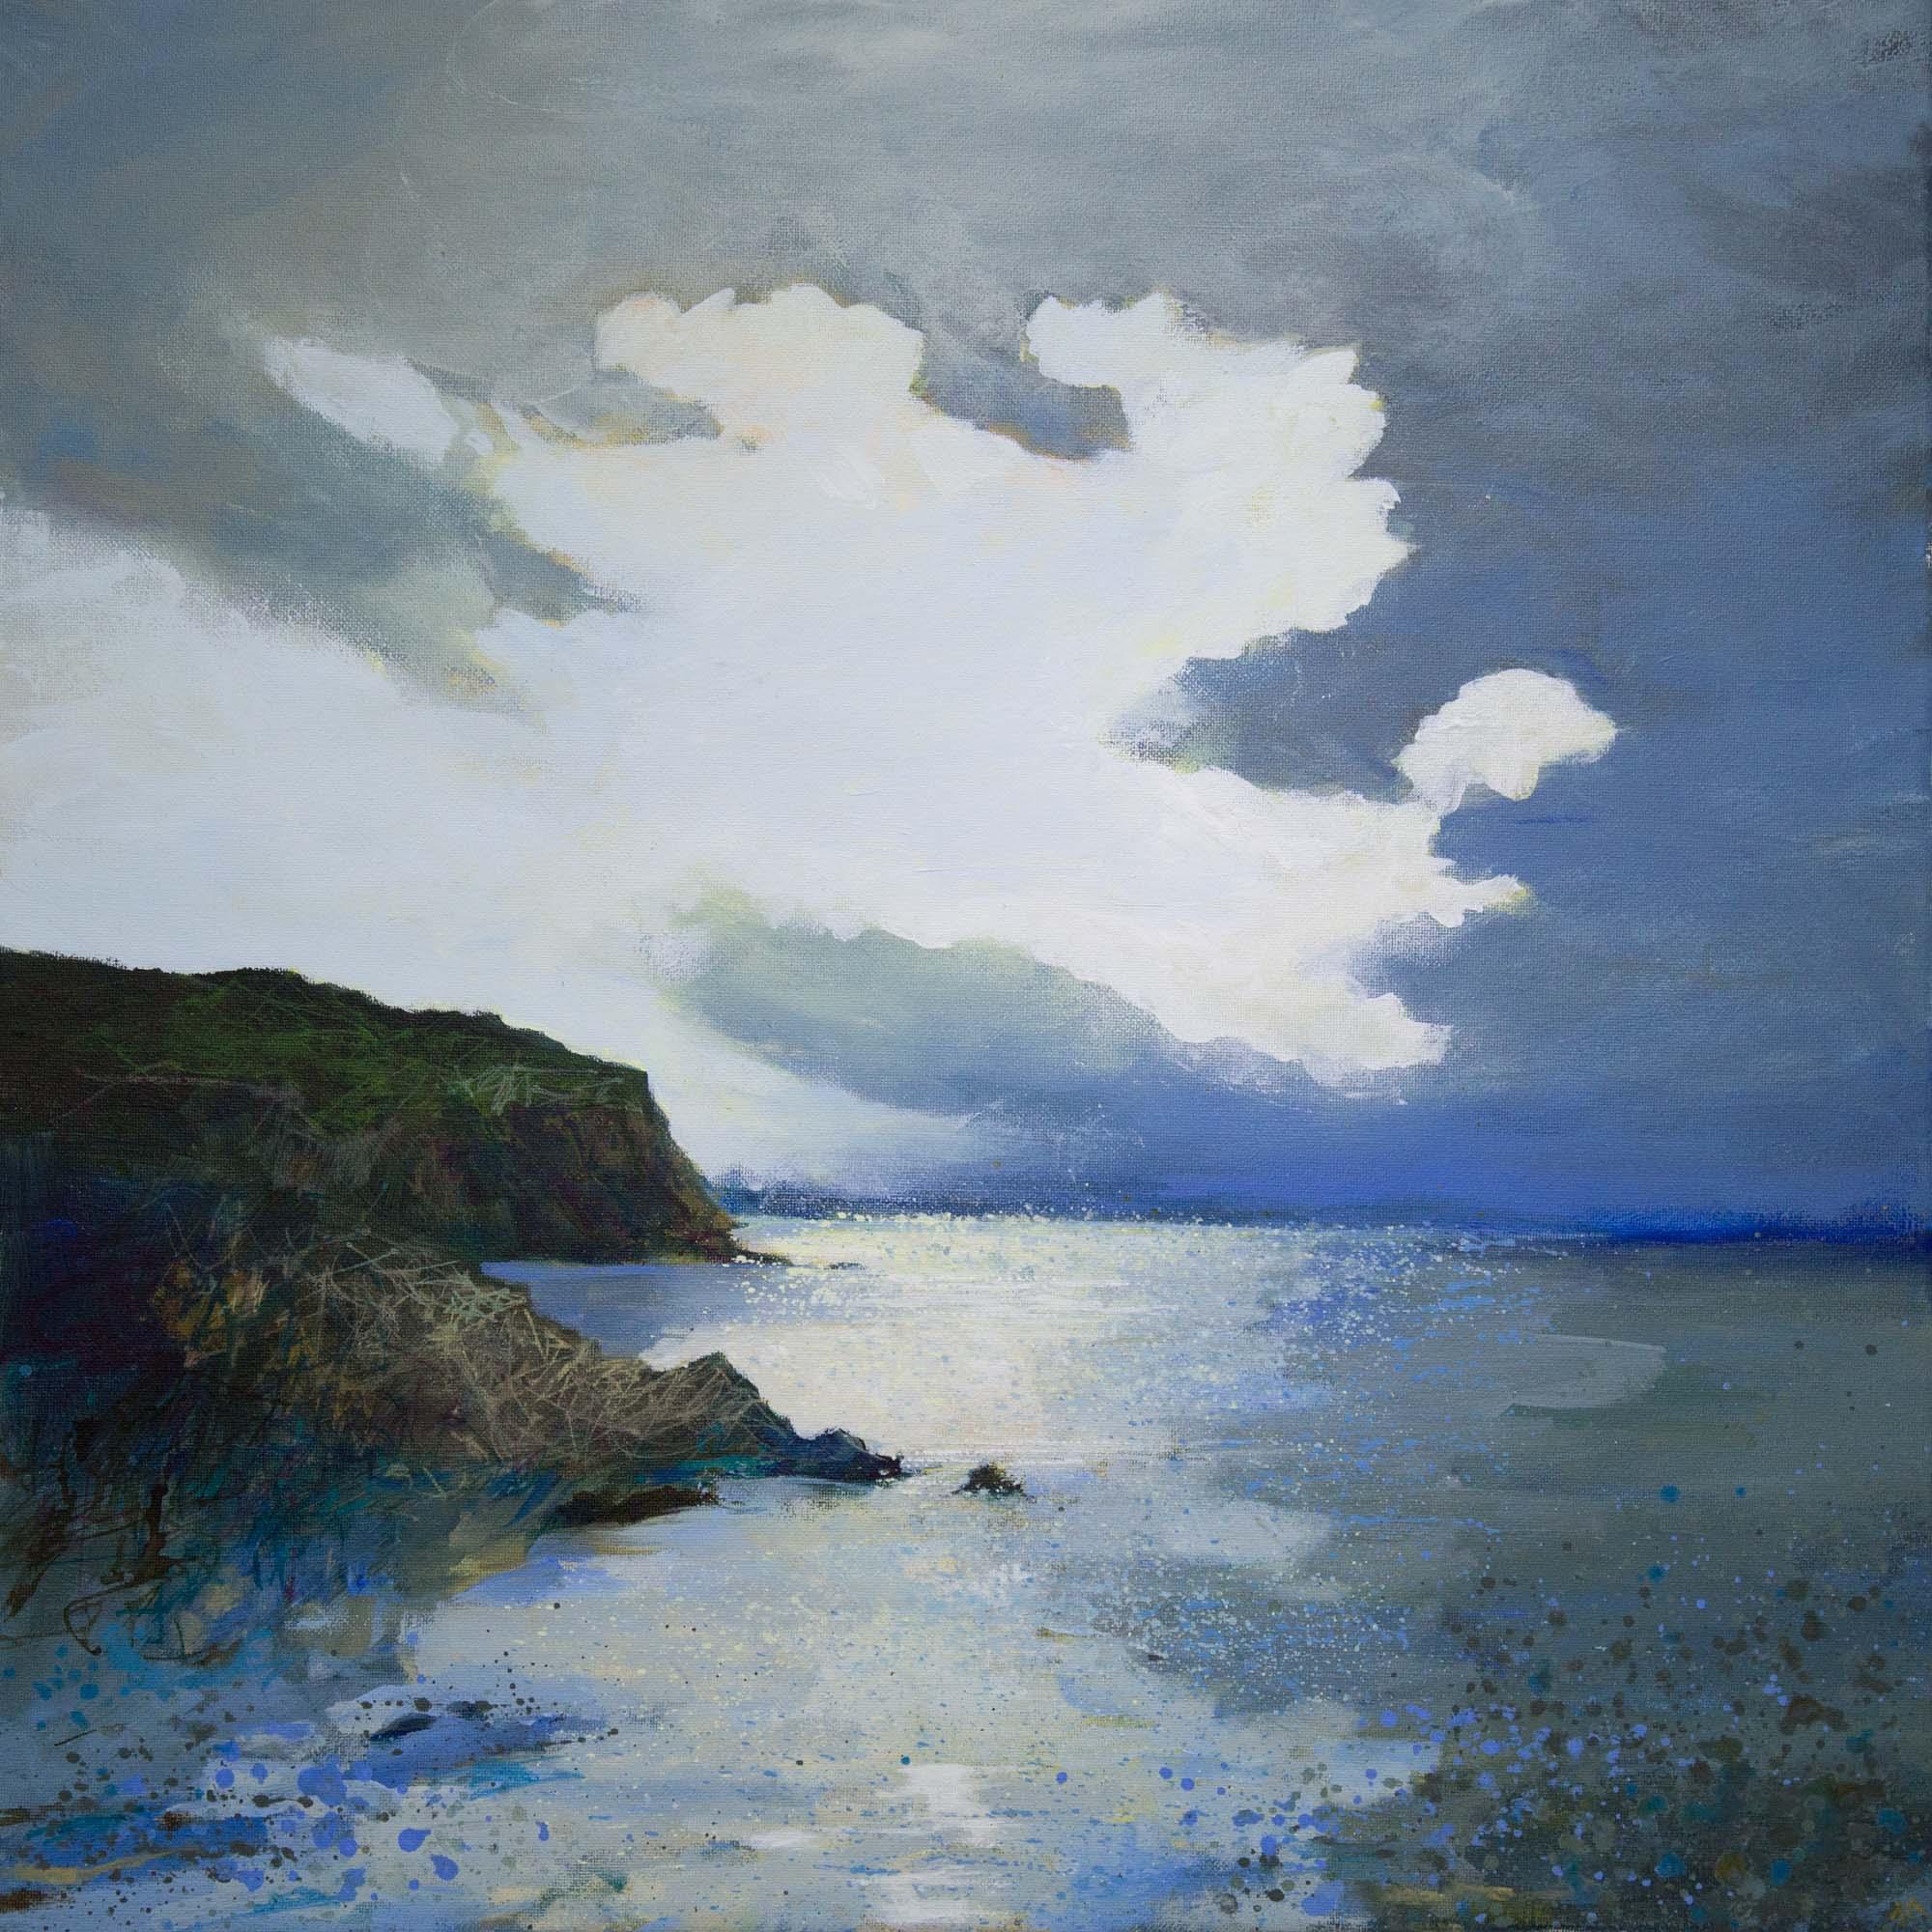 Evening at Sherkin North Shore 64x64cm.jpg